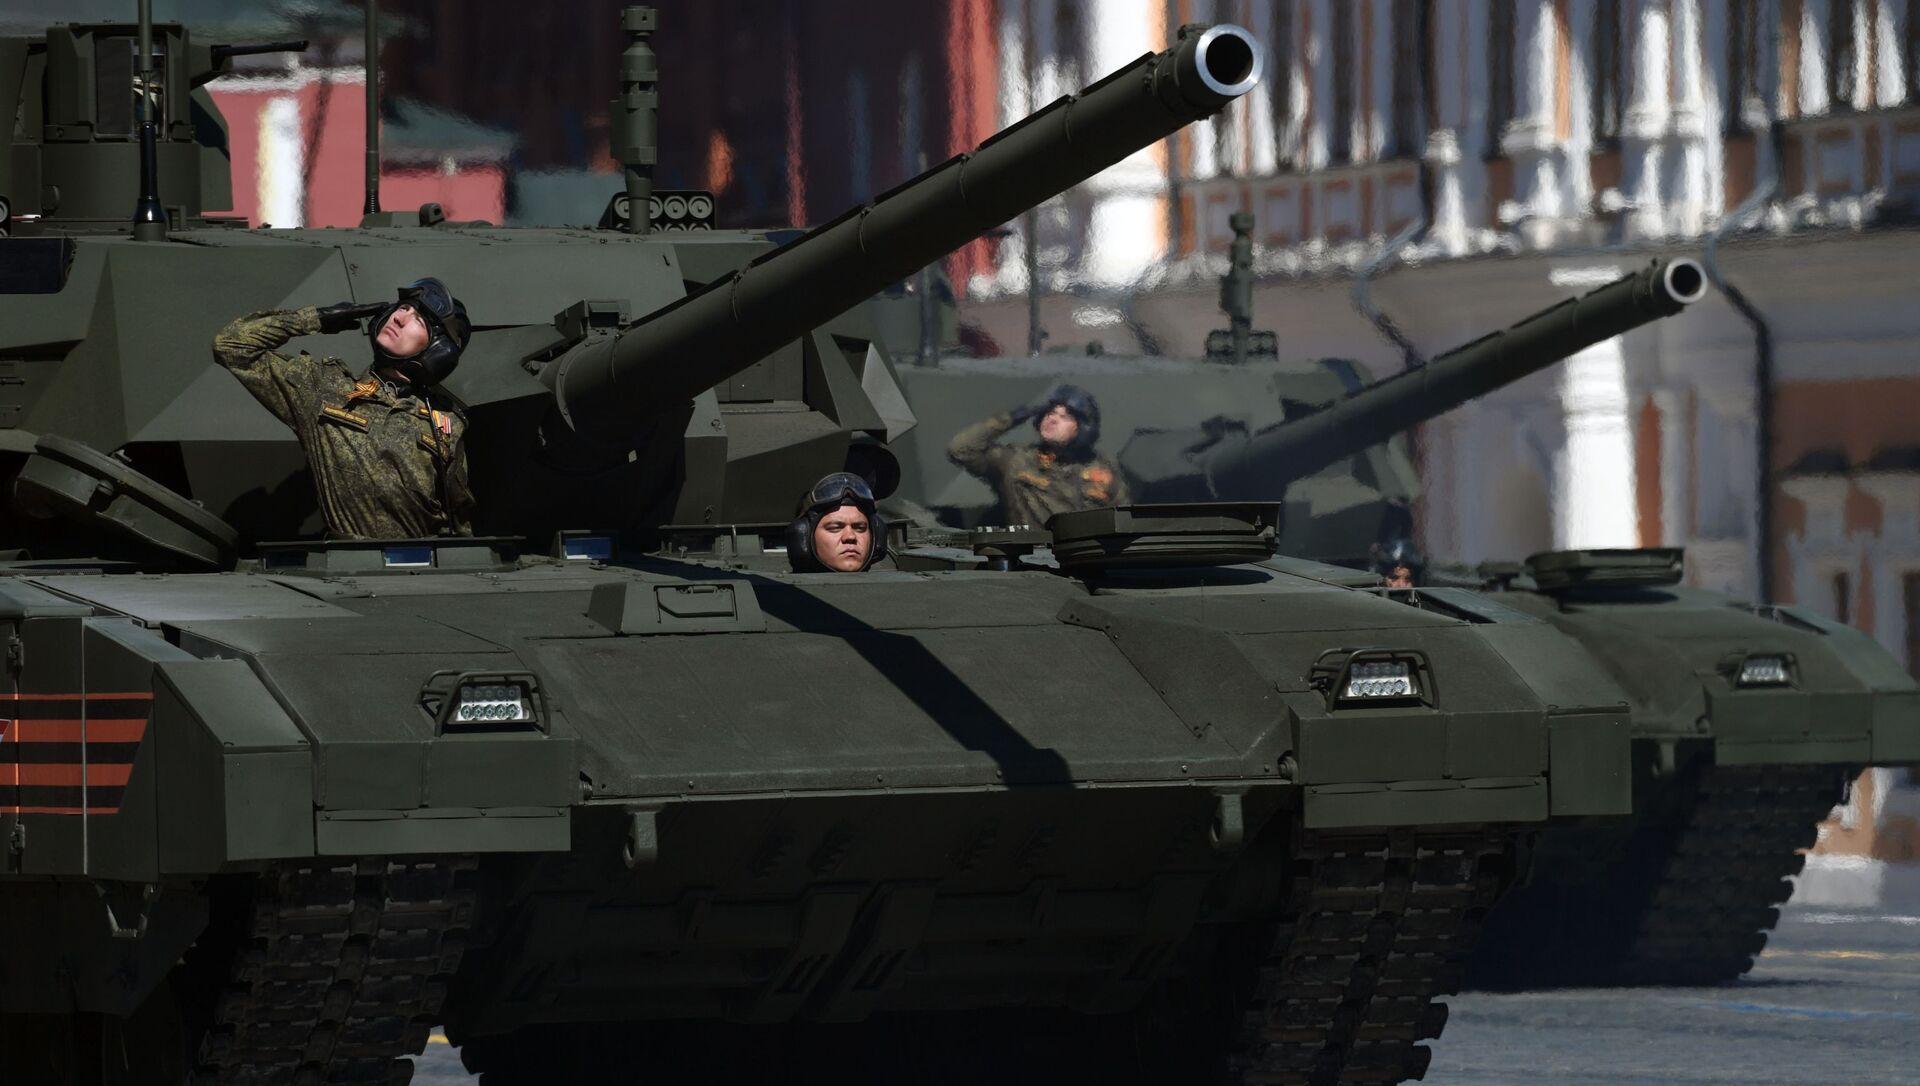 Tank T-14 Armata - Sputnik Česká republika, 1920, 04.02.2021